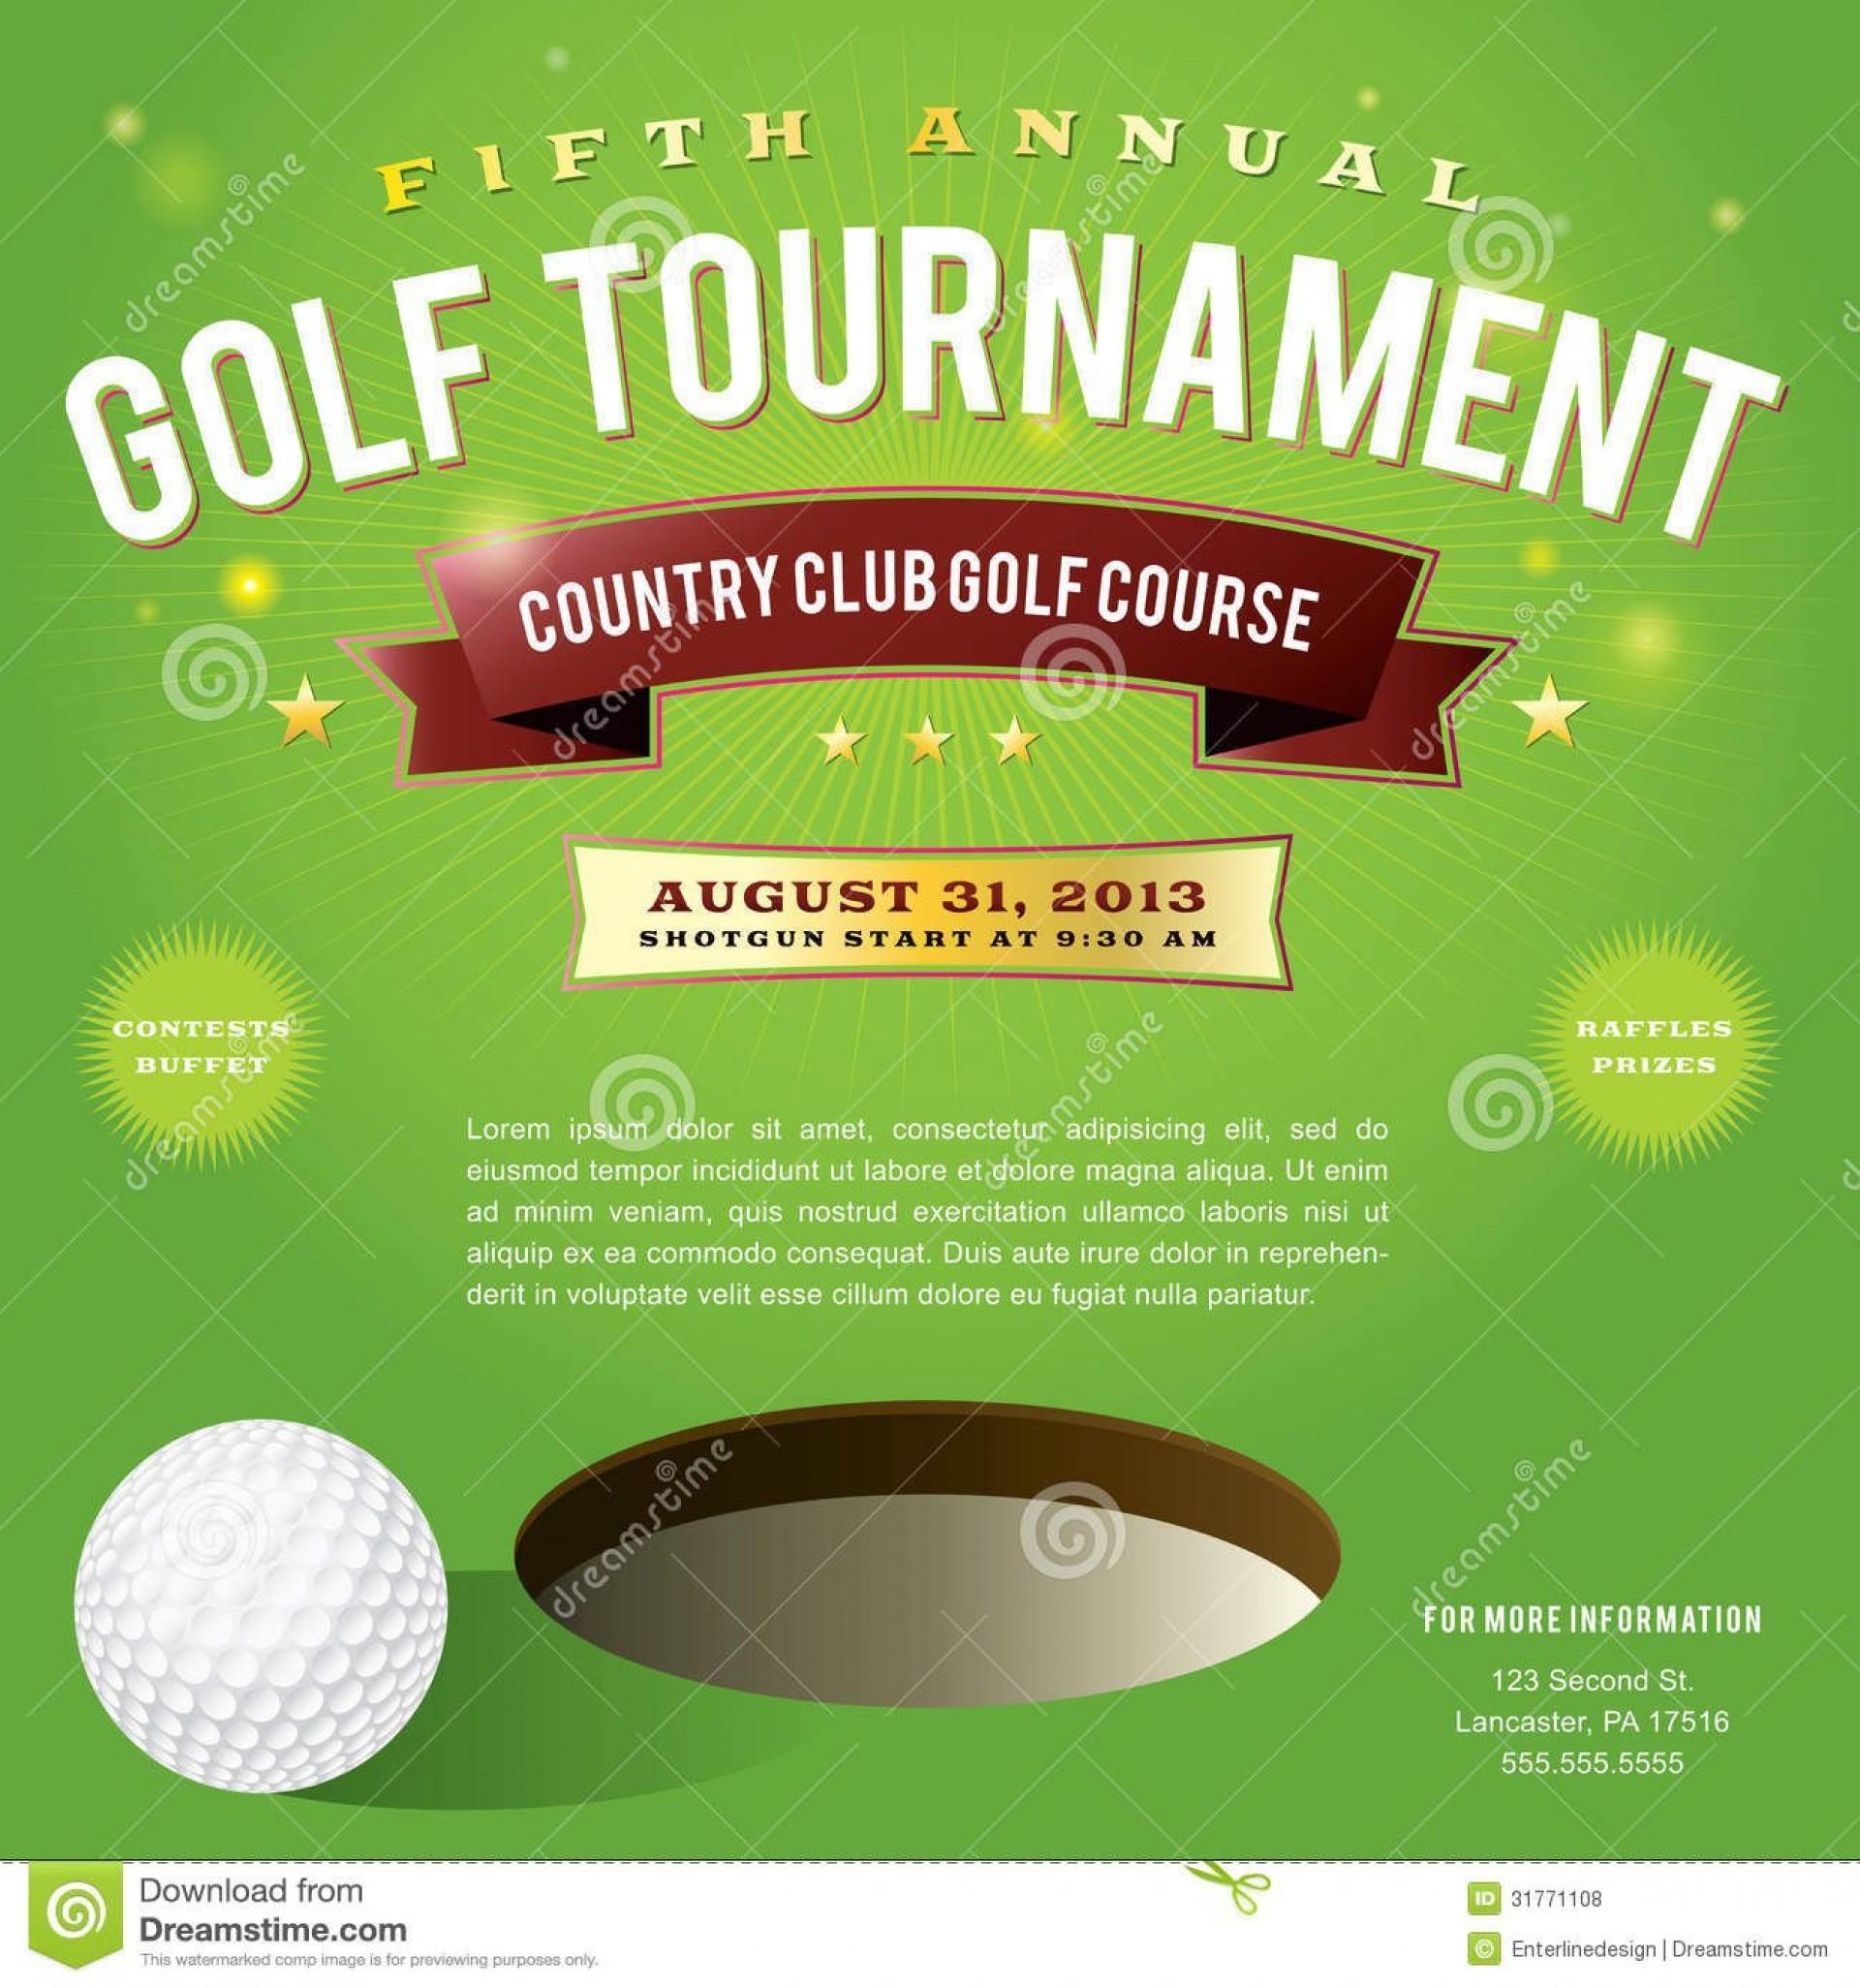 009 Singular Free Charity Golf Tournament Flyer Template Idea 1920